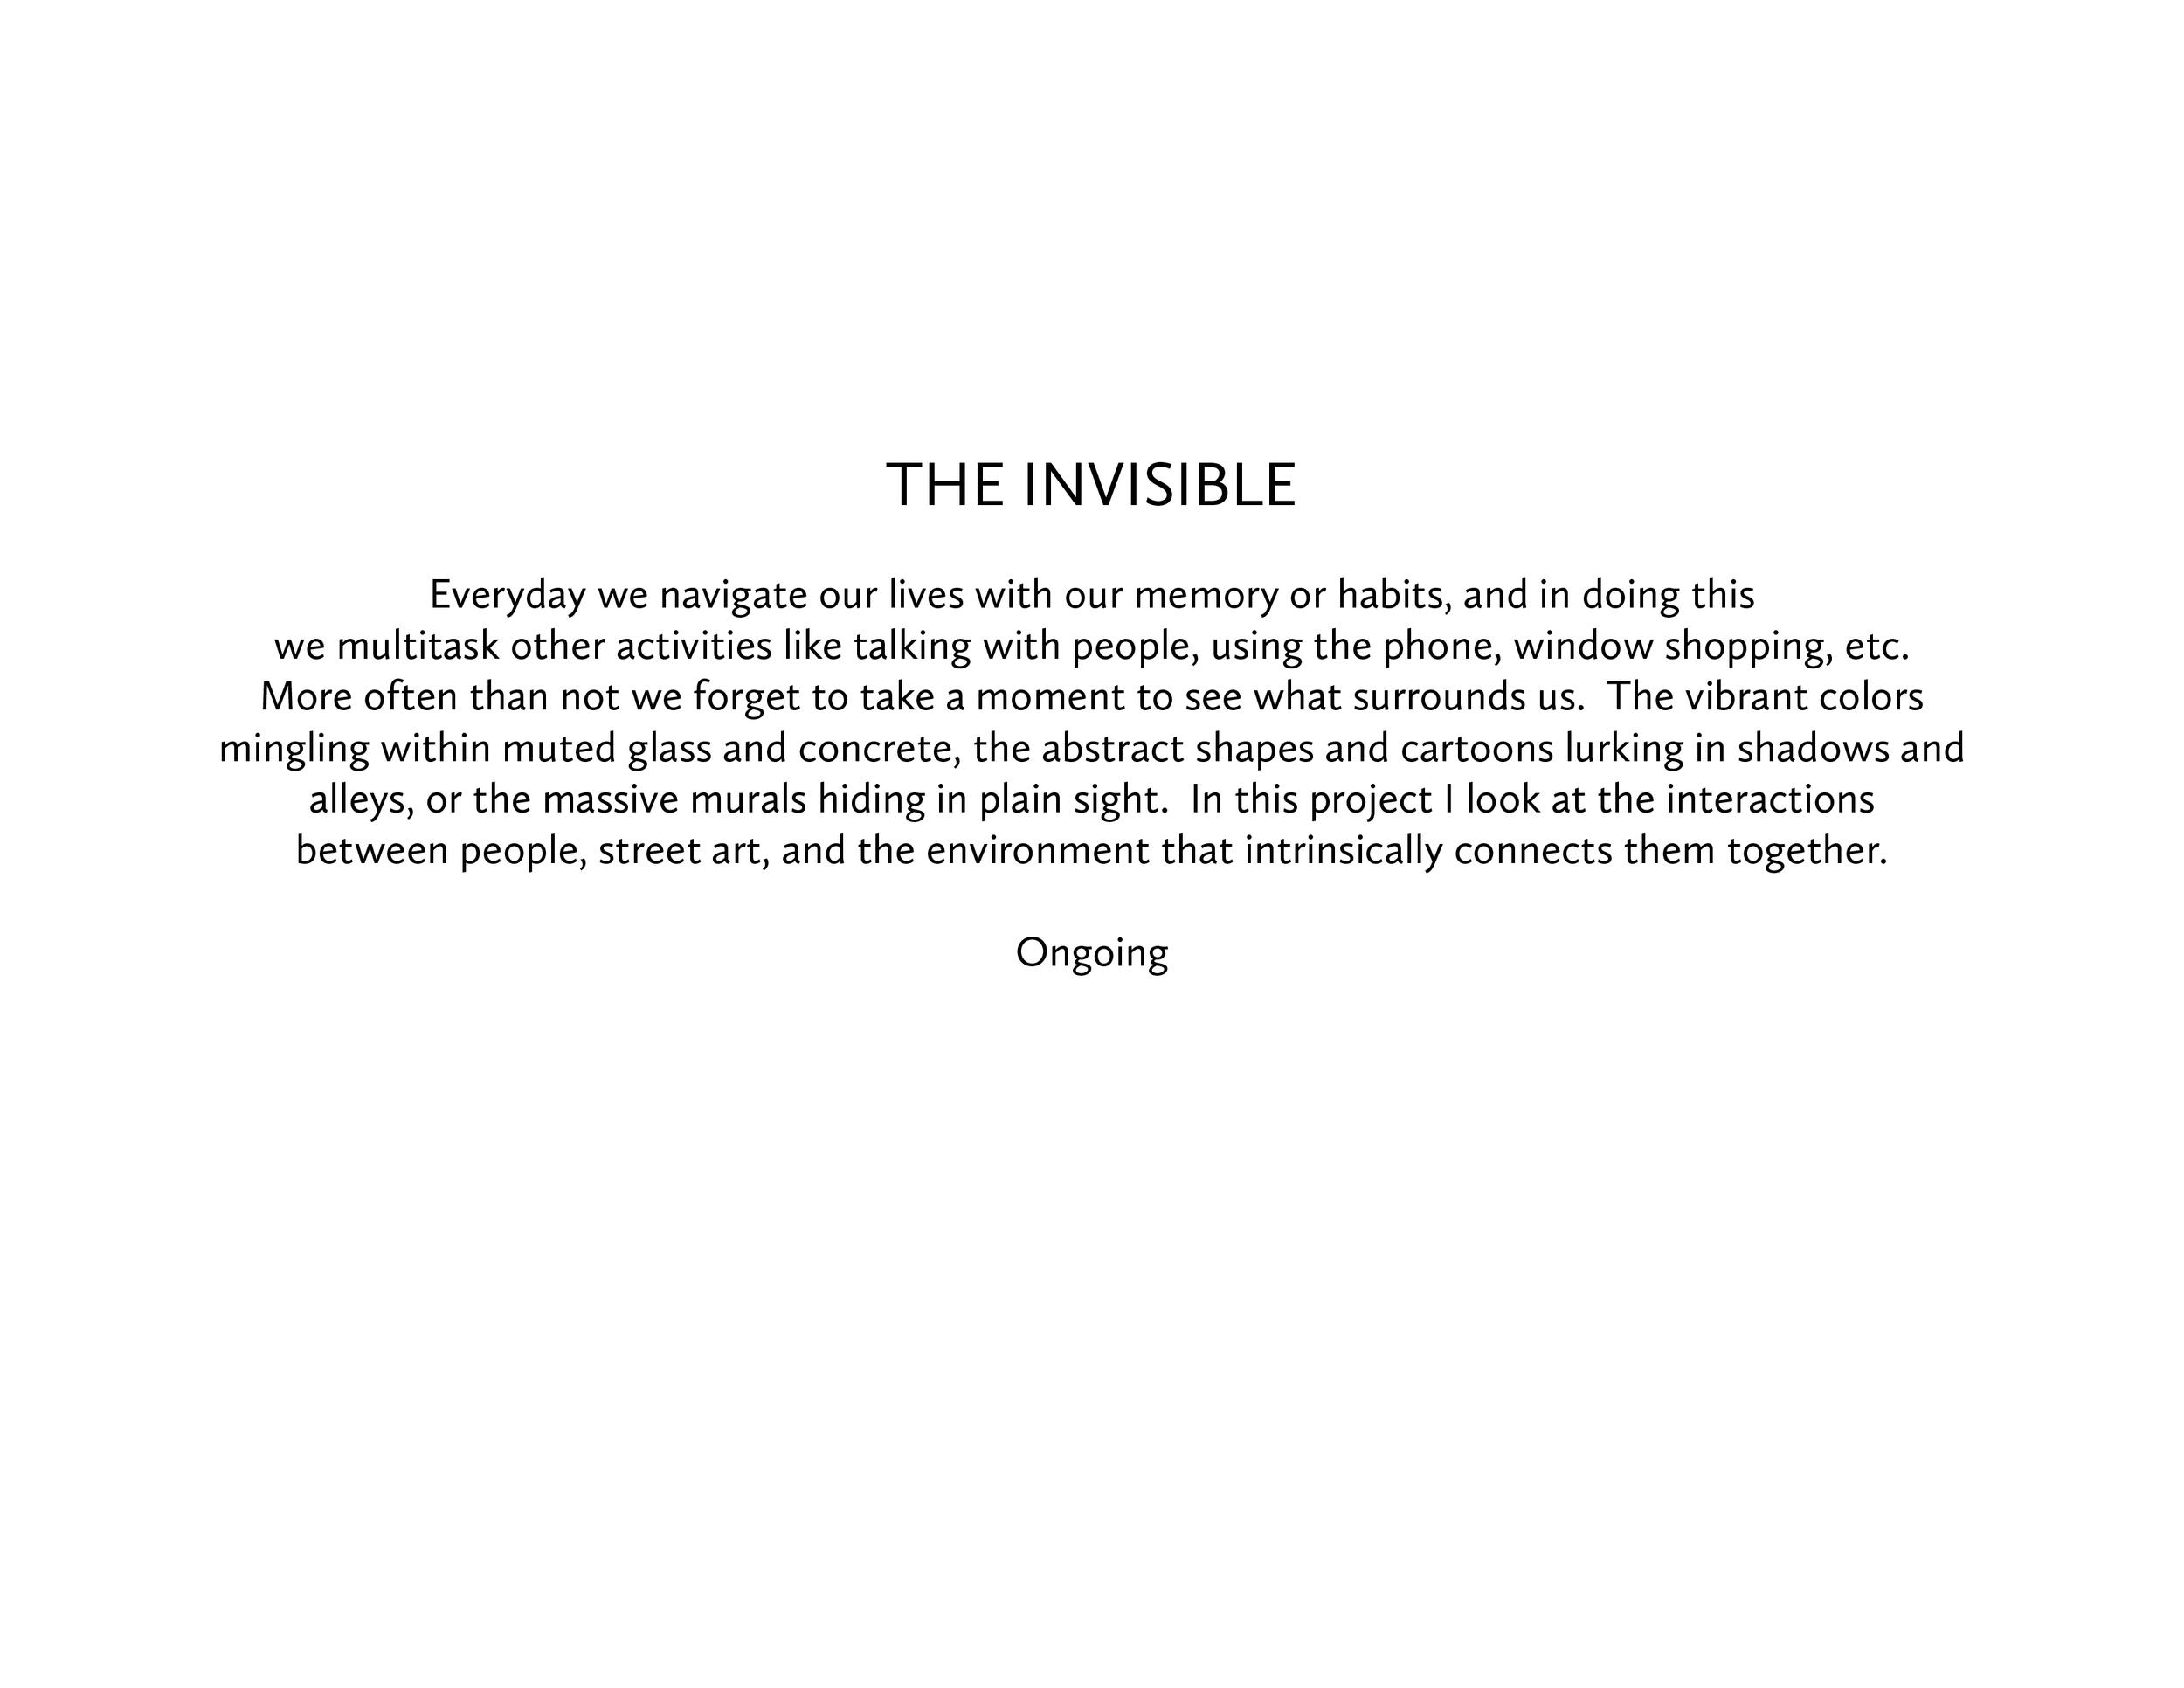 TheInvisibleDescription.jpg